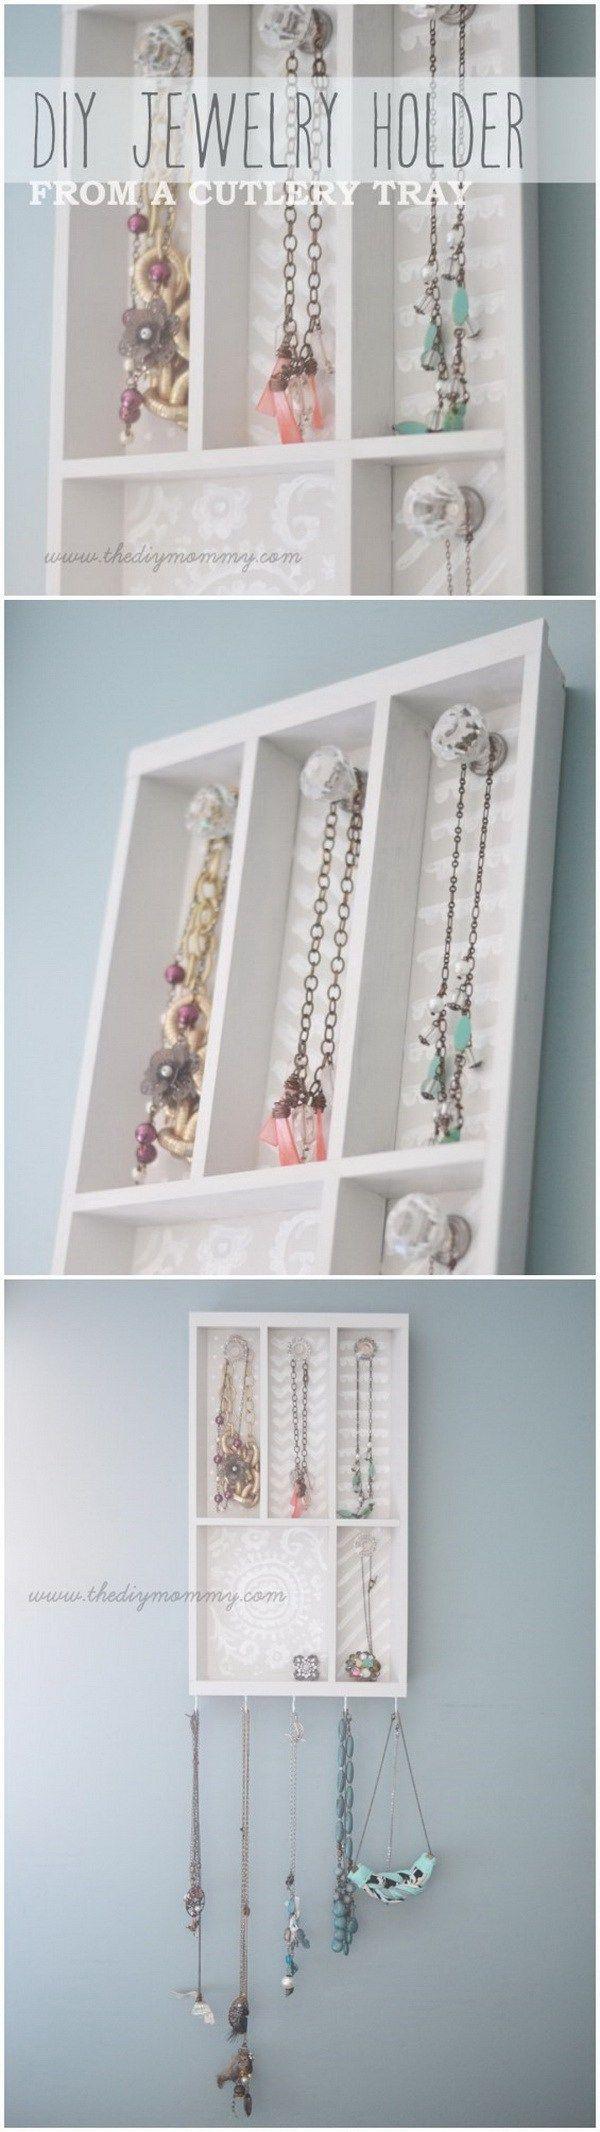 30 Brilliant DIY Jewelry Storage Display Ideas Jewellery holder